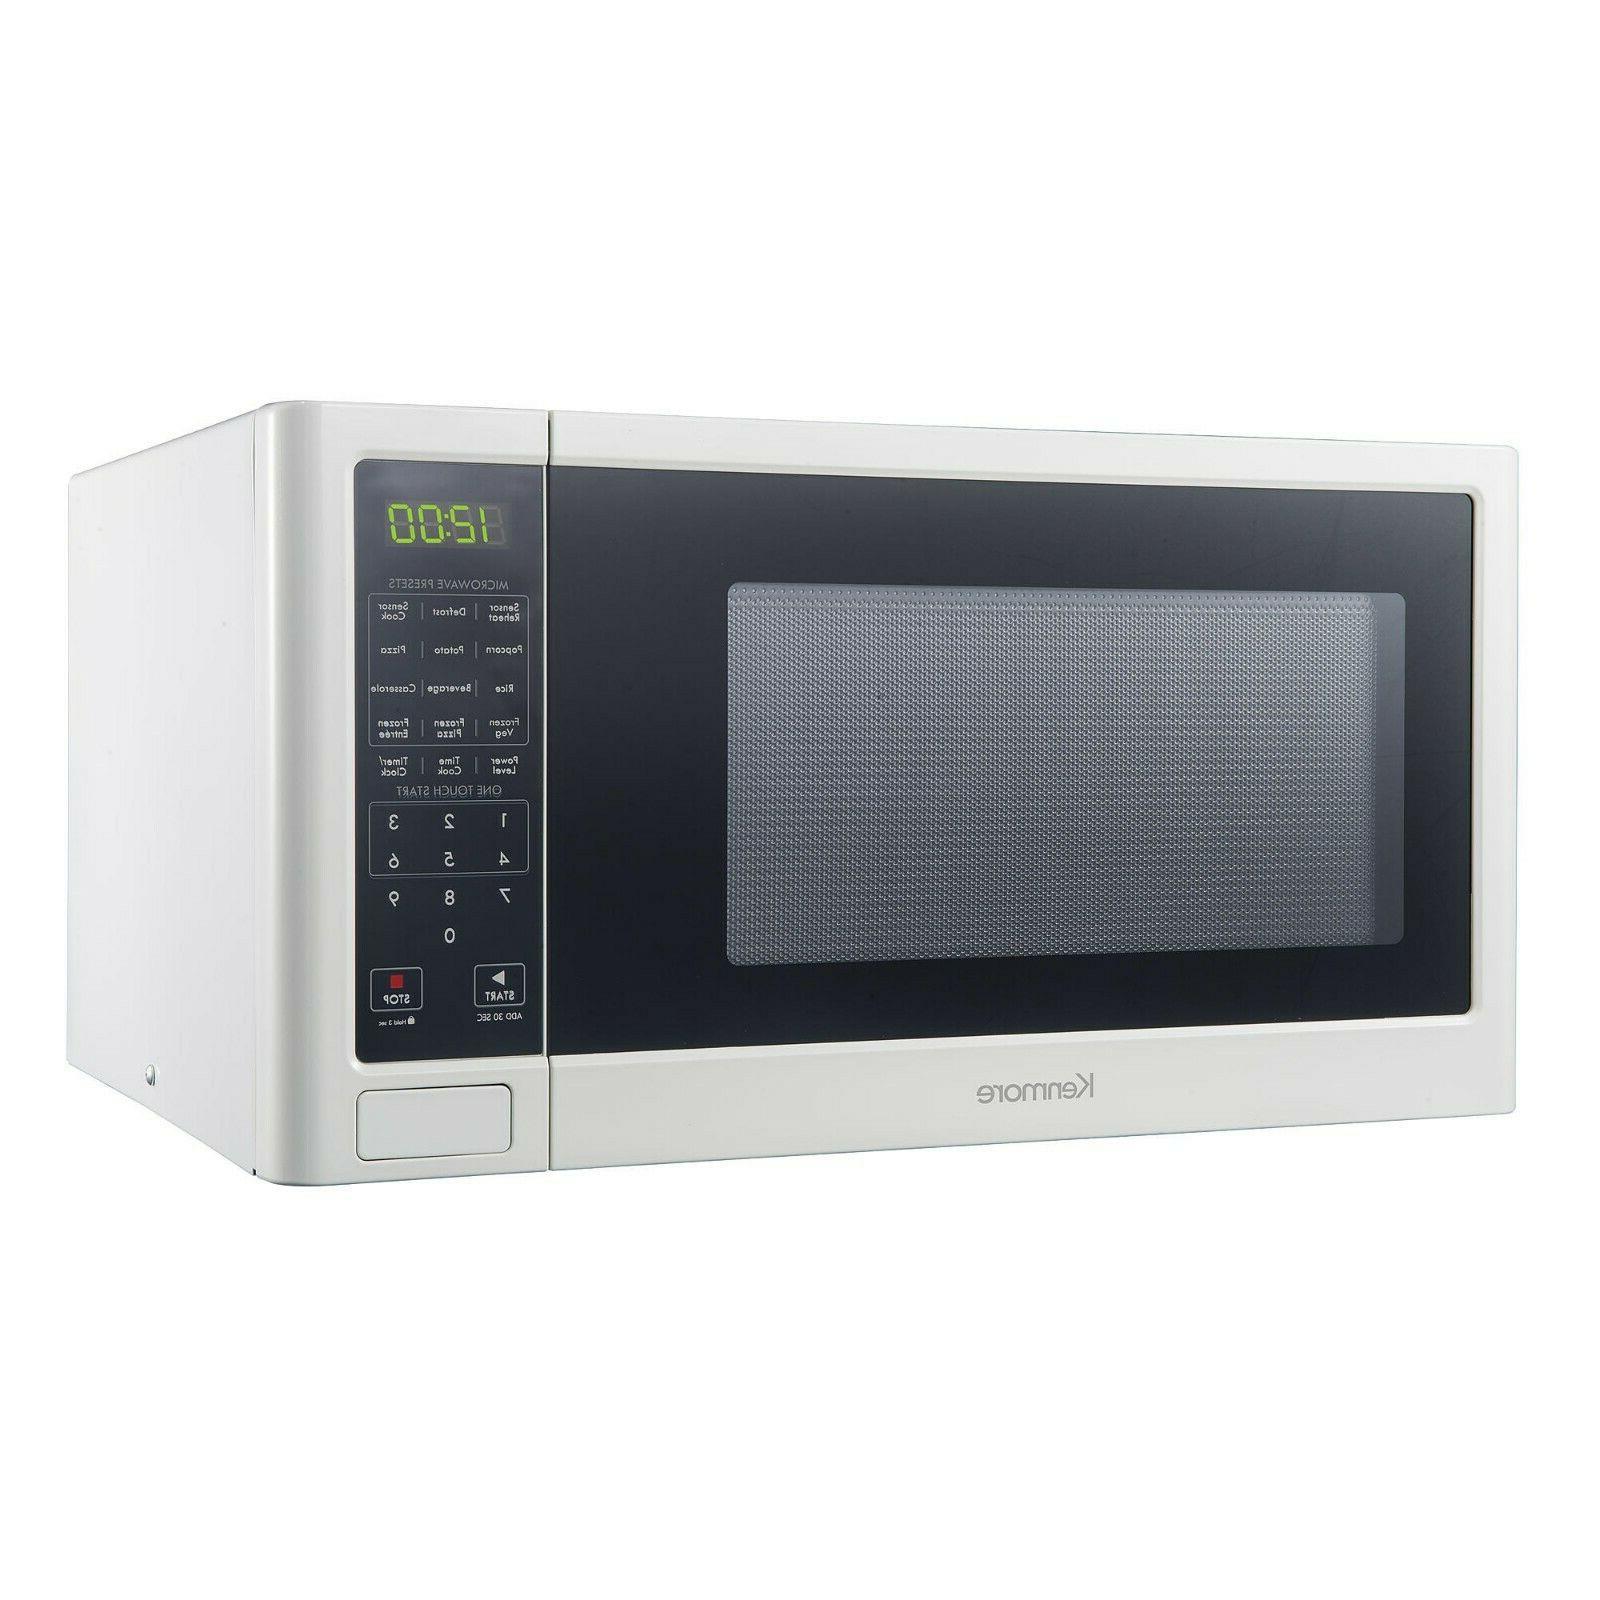 75652 countertop microwave oven 1 2 cu